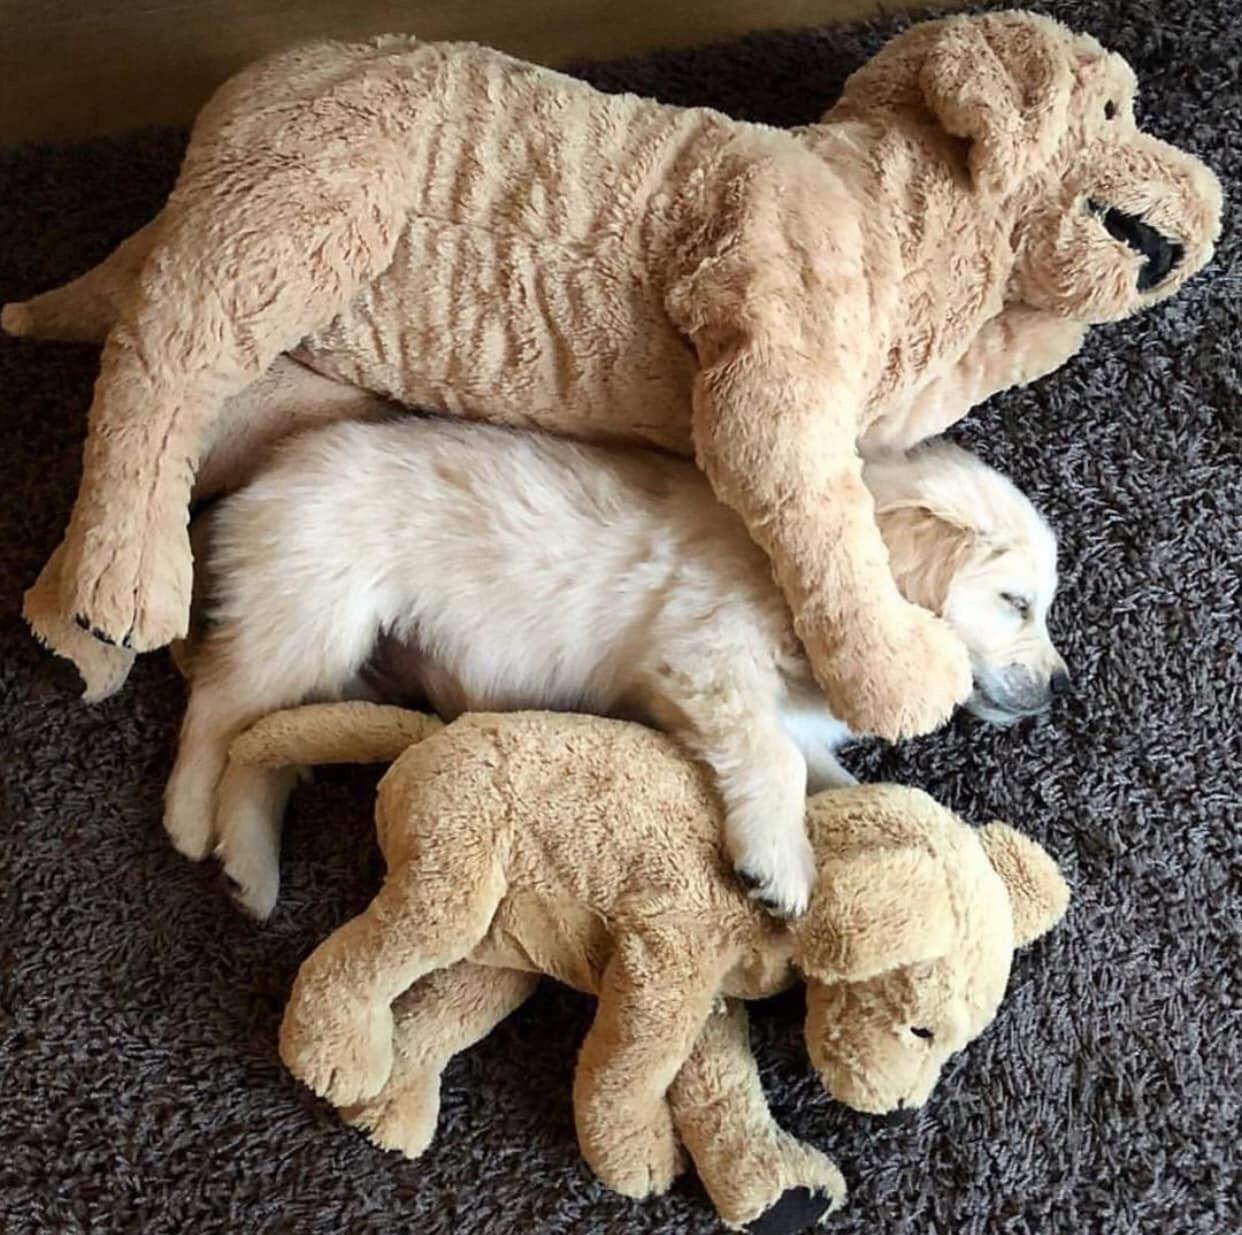 Kleine Langhaar Hunde - Kleine Langhaar Hunde